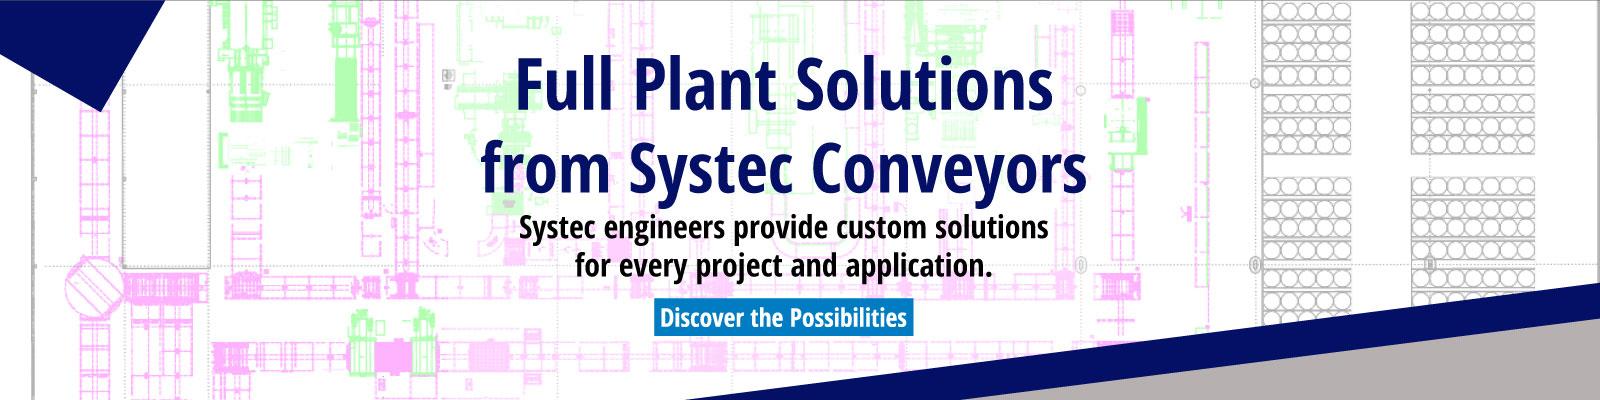 Jan. Full Plant Solutions